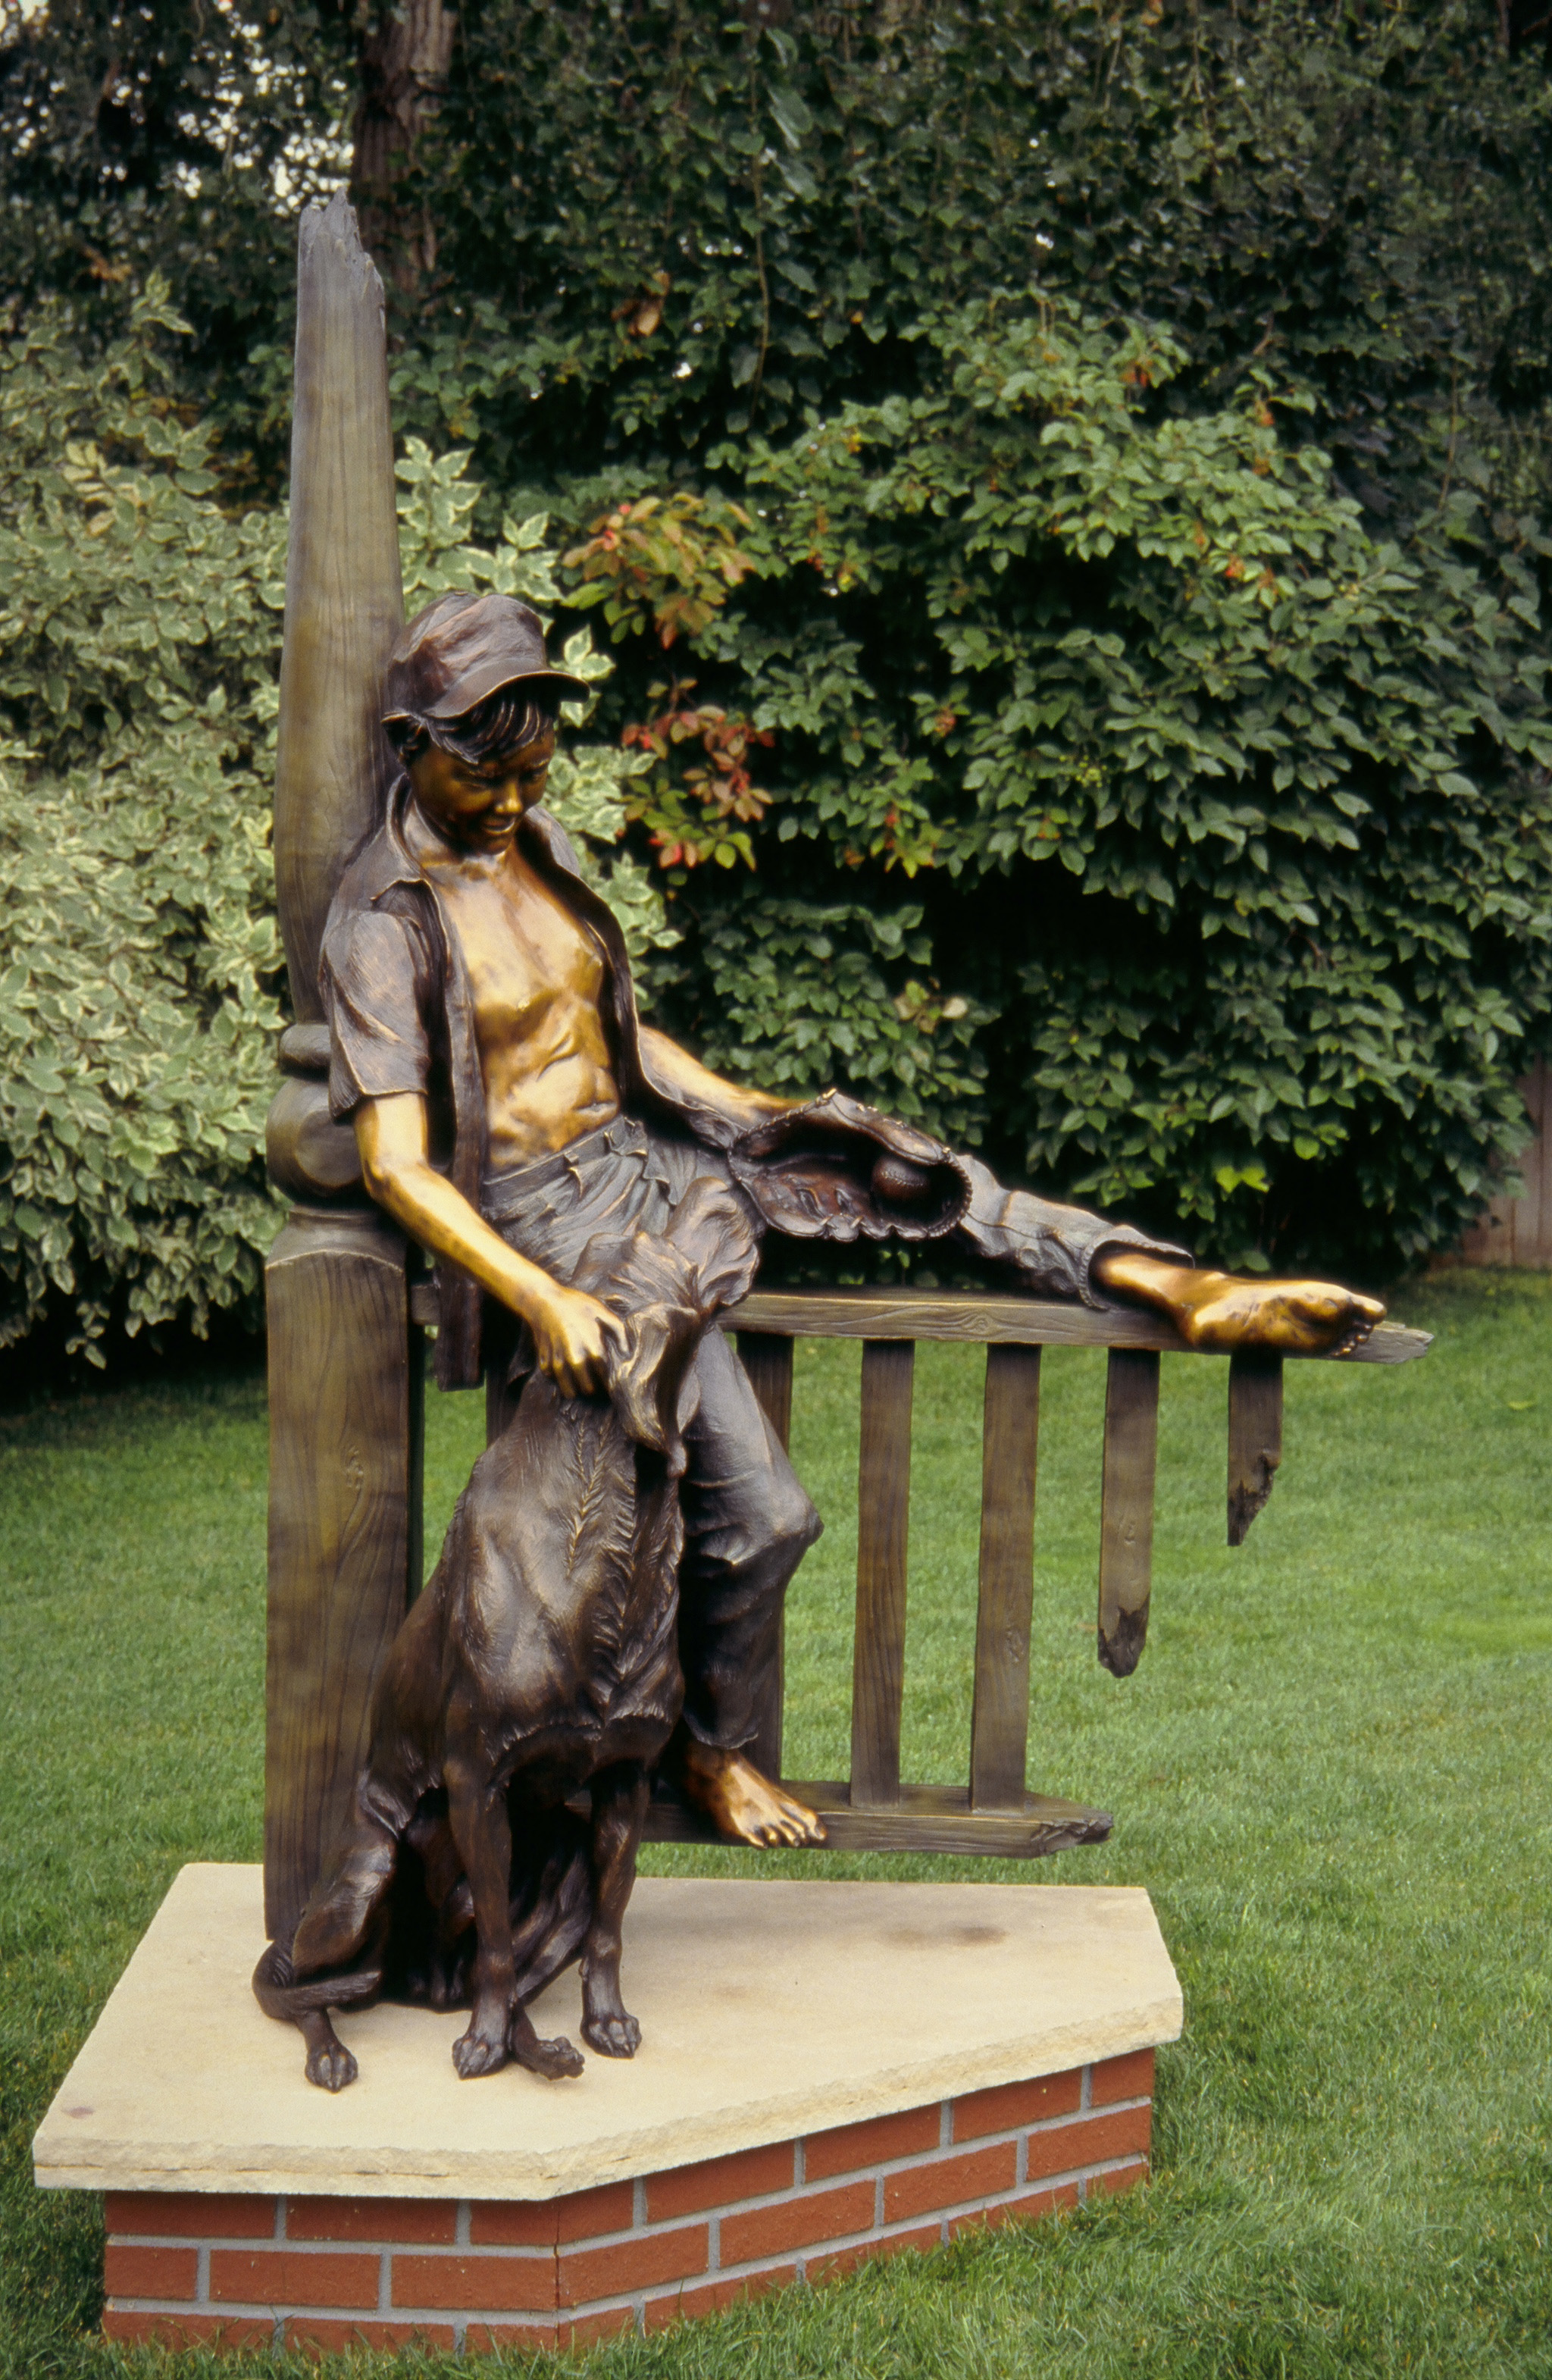 Best Friends bronze sculpture by Colorado artist Greg